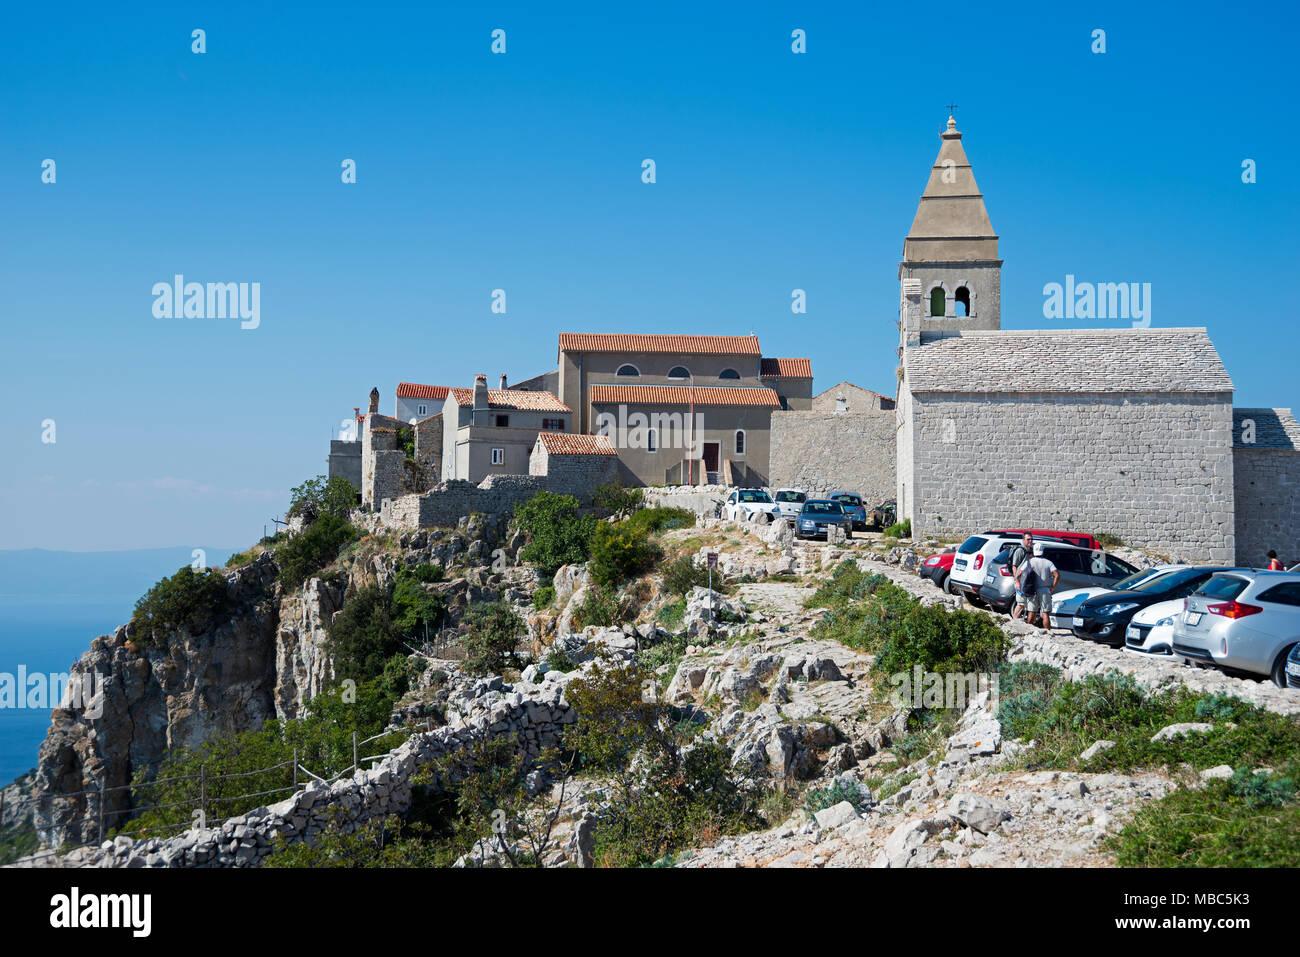 Parish Church of the Blessed Virgin Mary, Lubenice, Cres Island, Kvarner Gulf Bay, Croatia - Stock Image